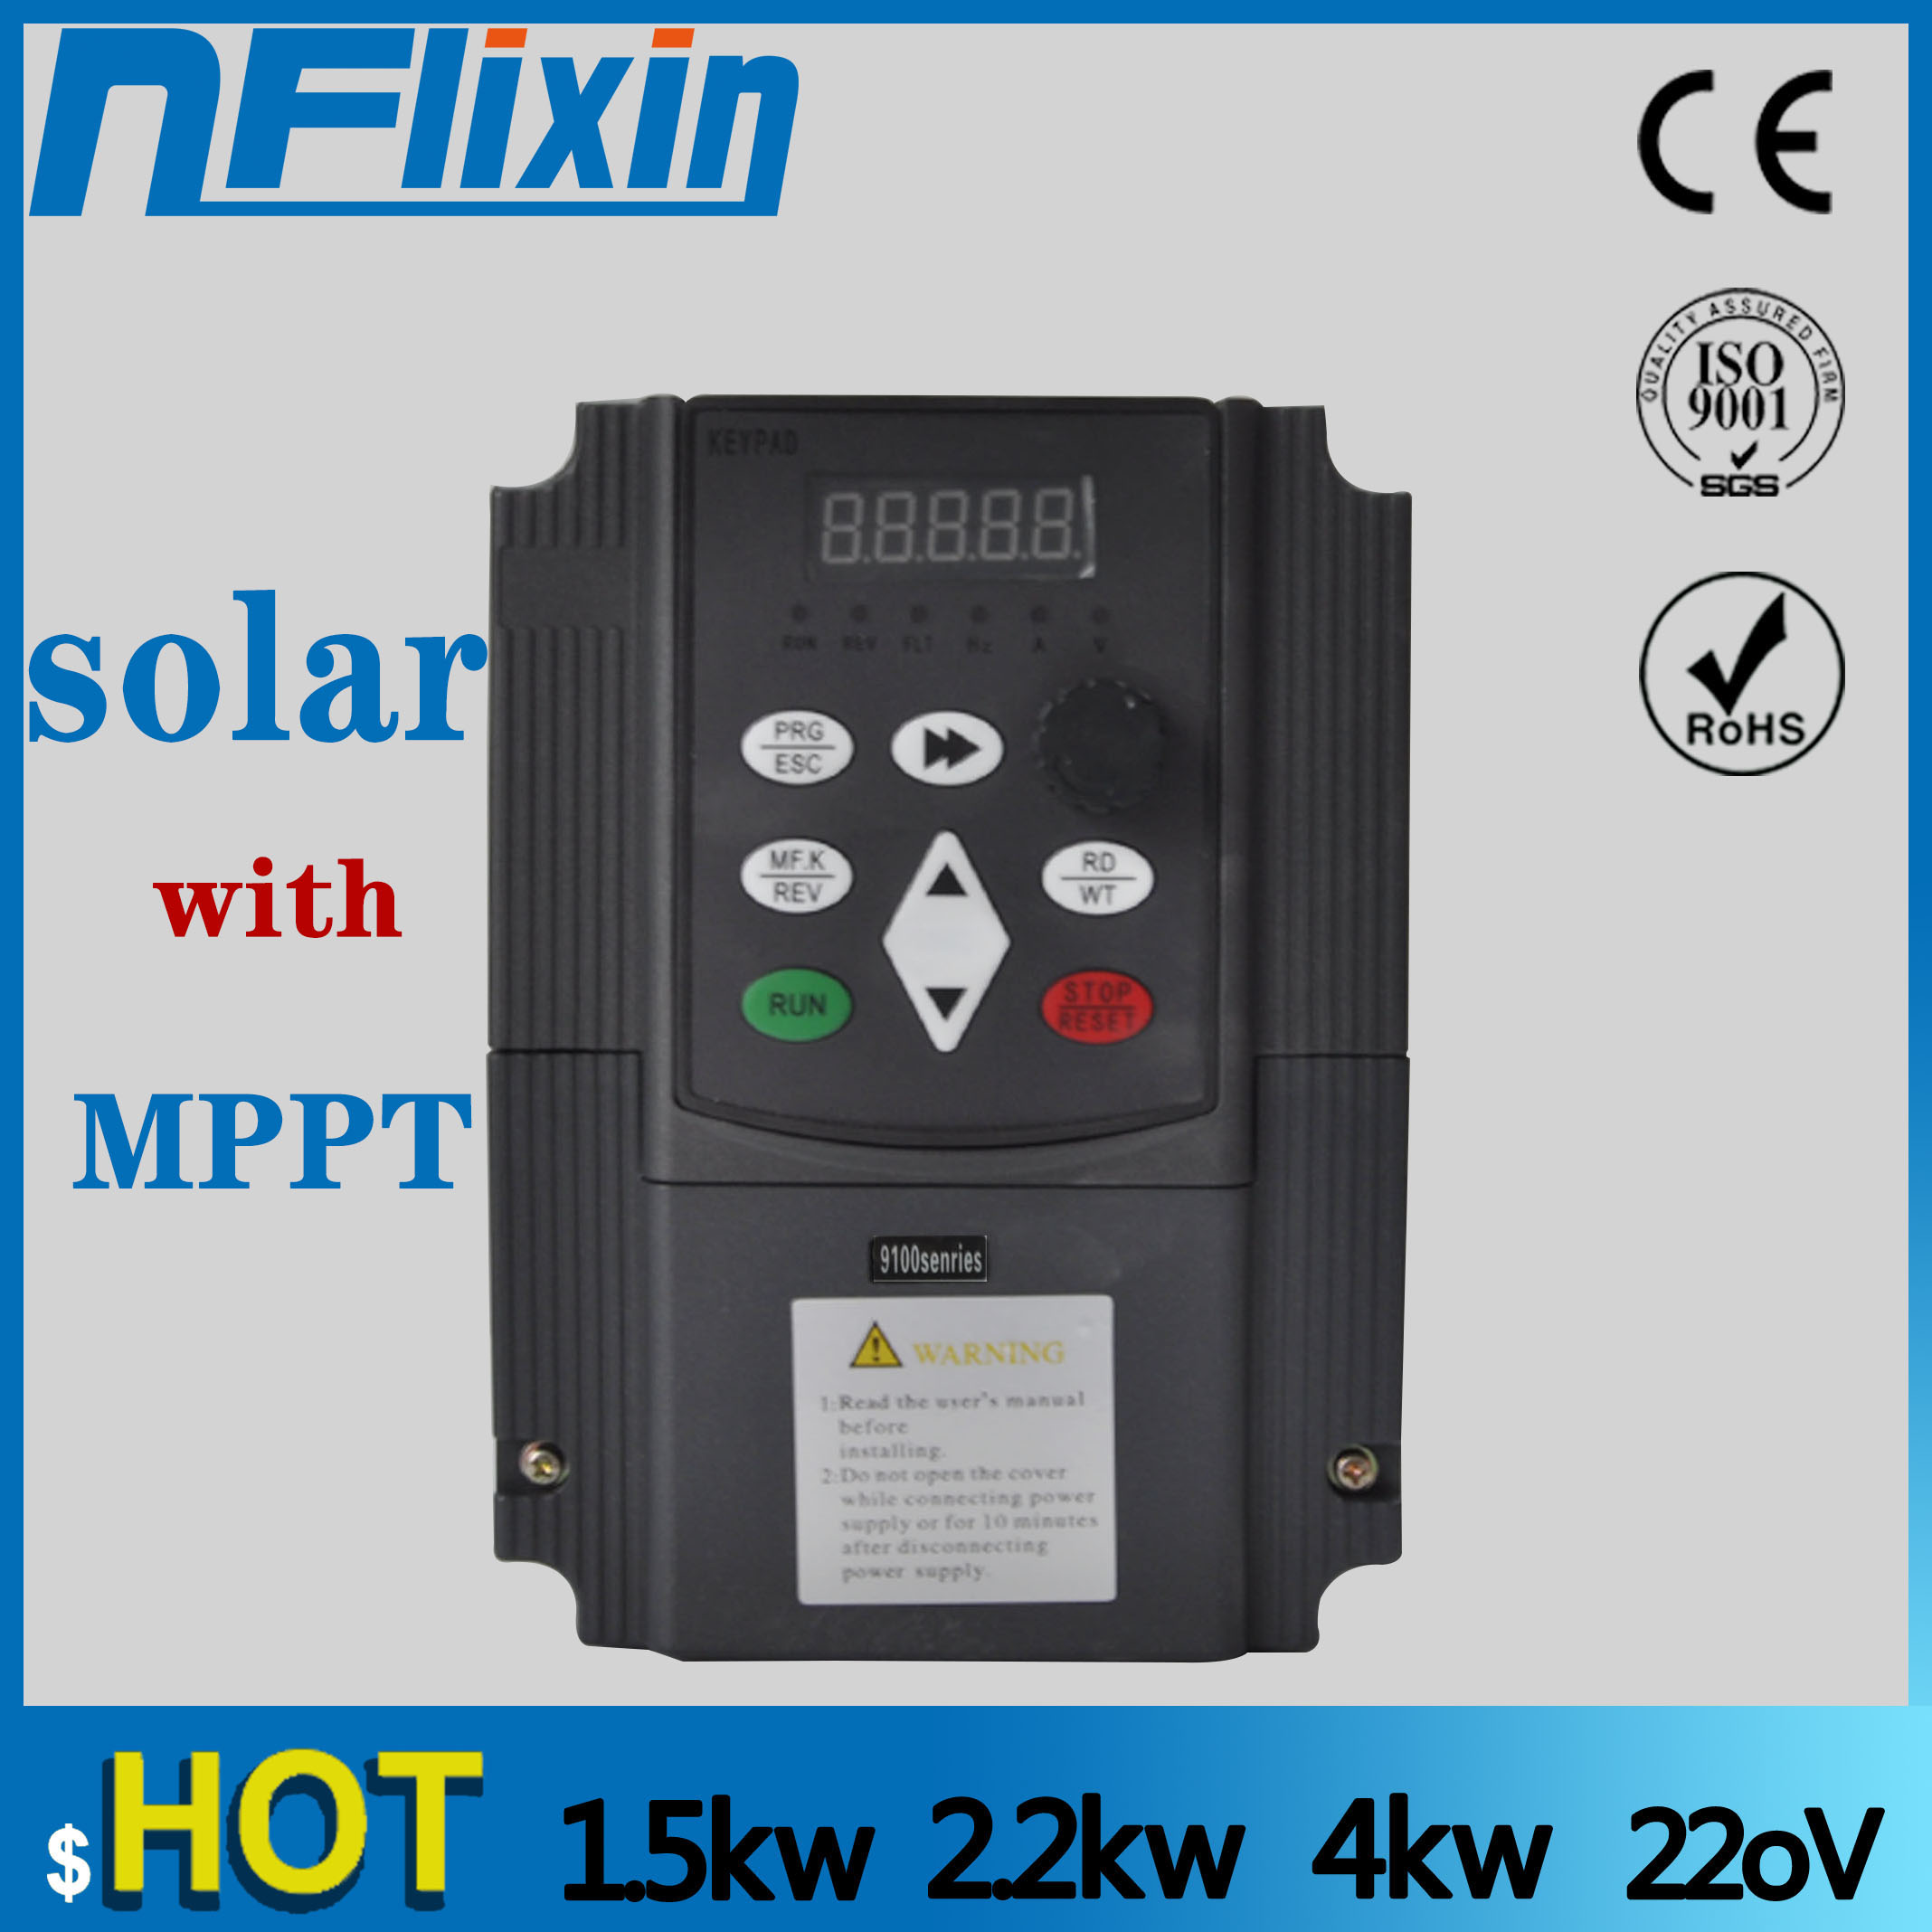 NF9100 Vector Control frequenz konverter DC 200 V-400 V zu Drei-phase 220V solar pumpe inverter mit MPPT steuer